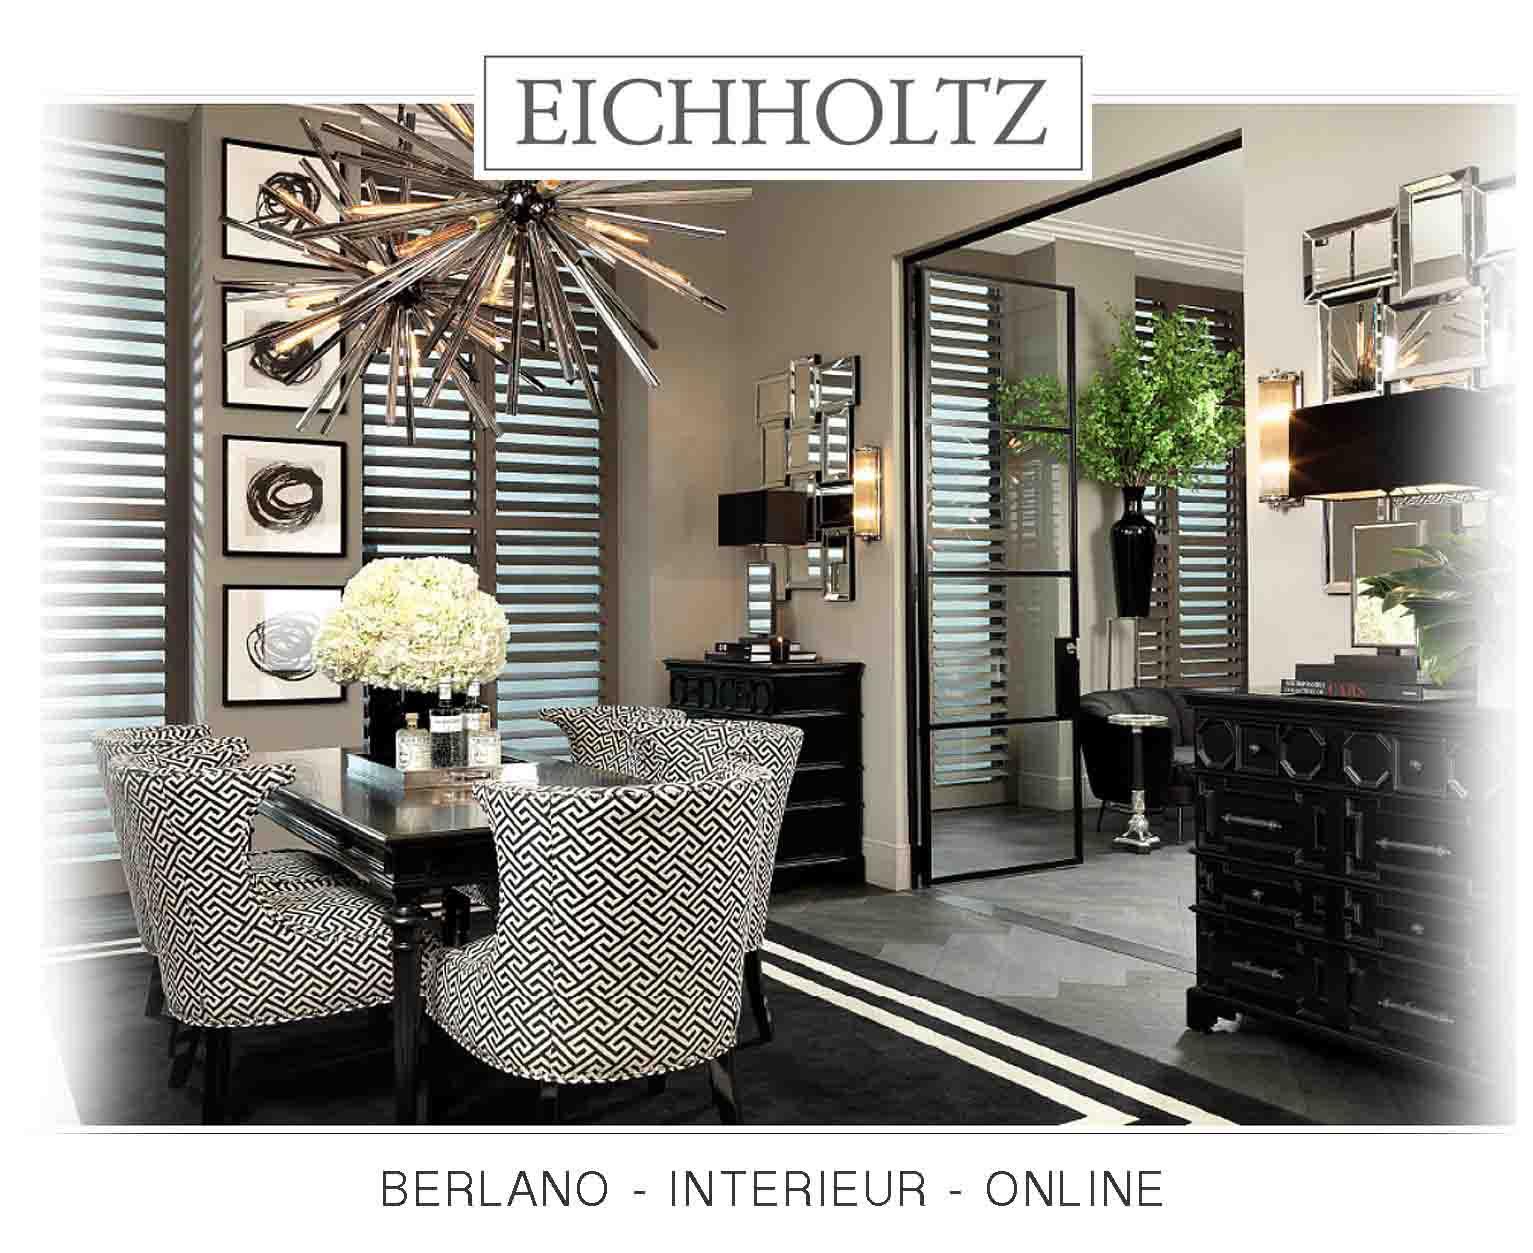 eichholtz dealer the netherlands europe online bestellen van eichholtz meubels bij berlanonl berlanonl interieur tuinmeubilair